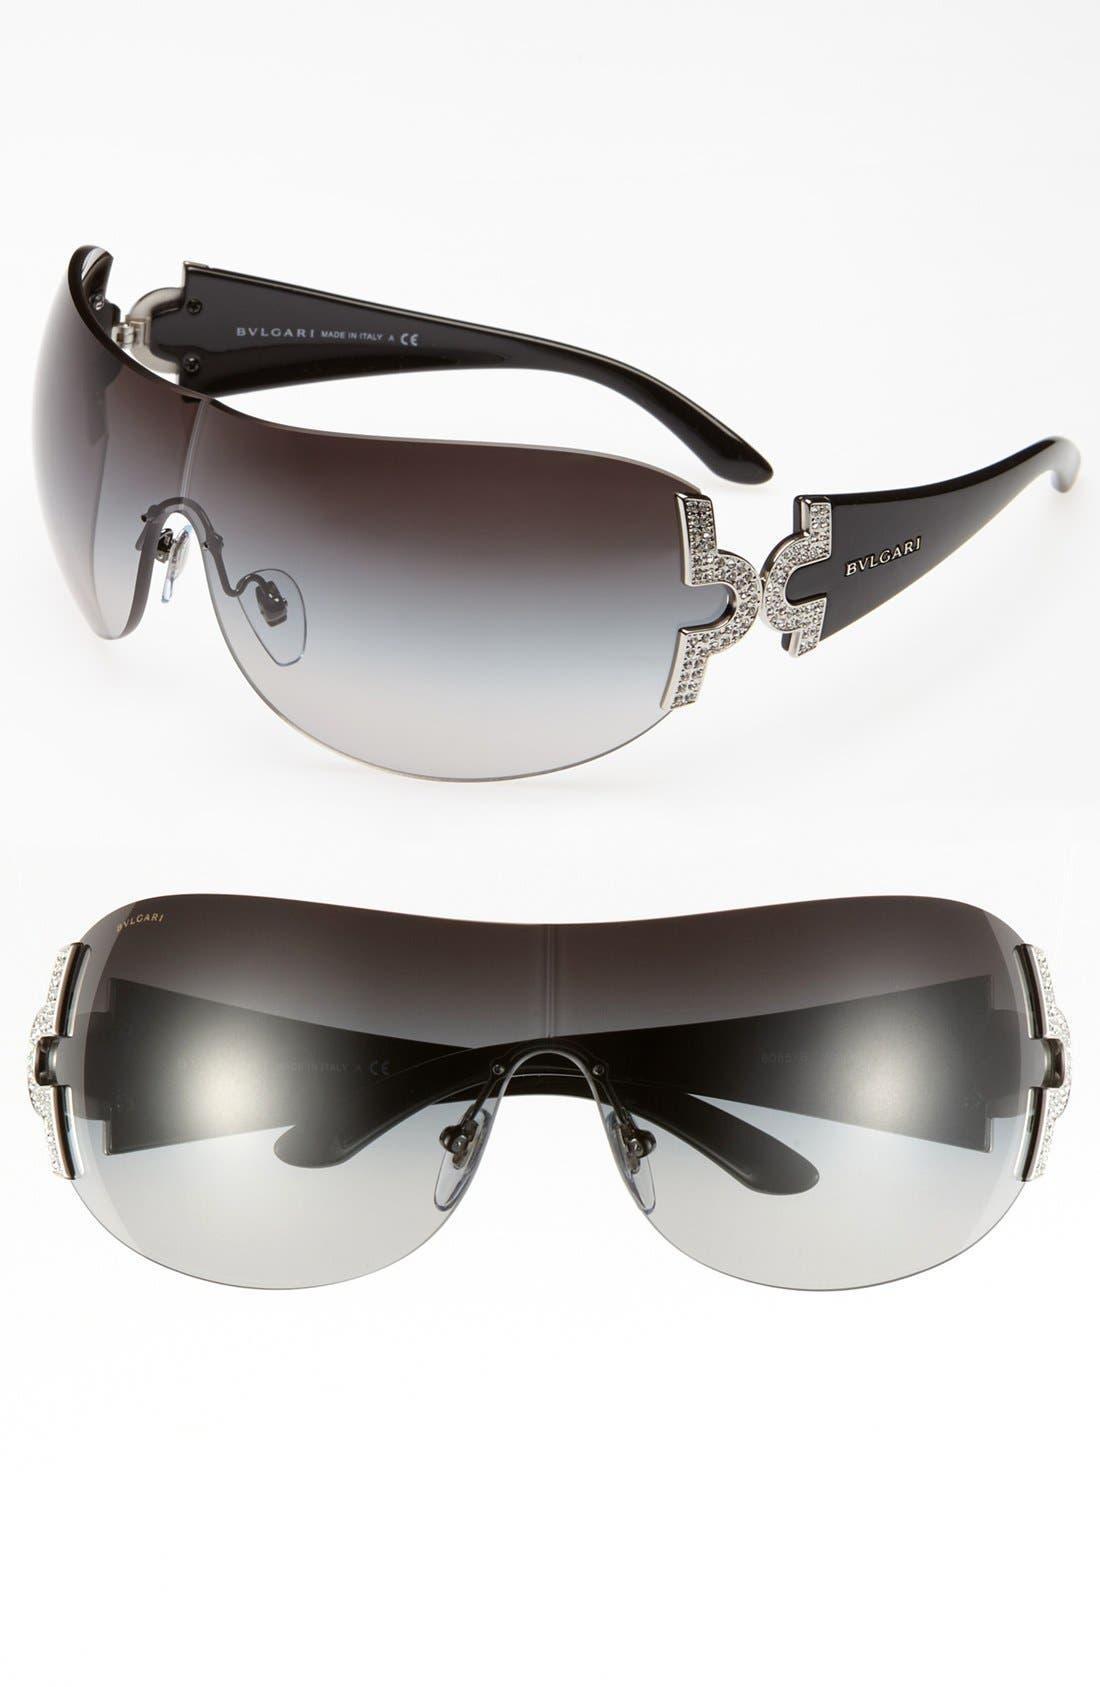 BVLGARI 39mm Embellished Temple Shield Sunglasses